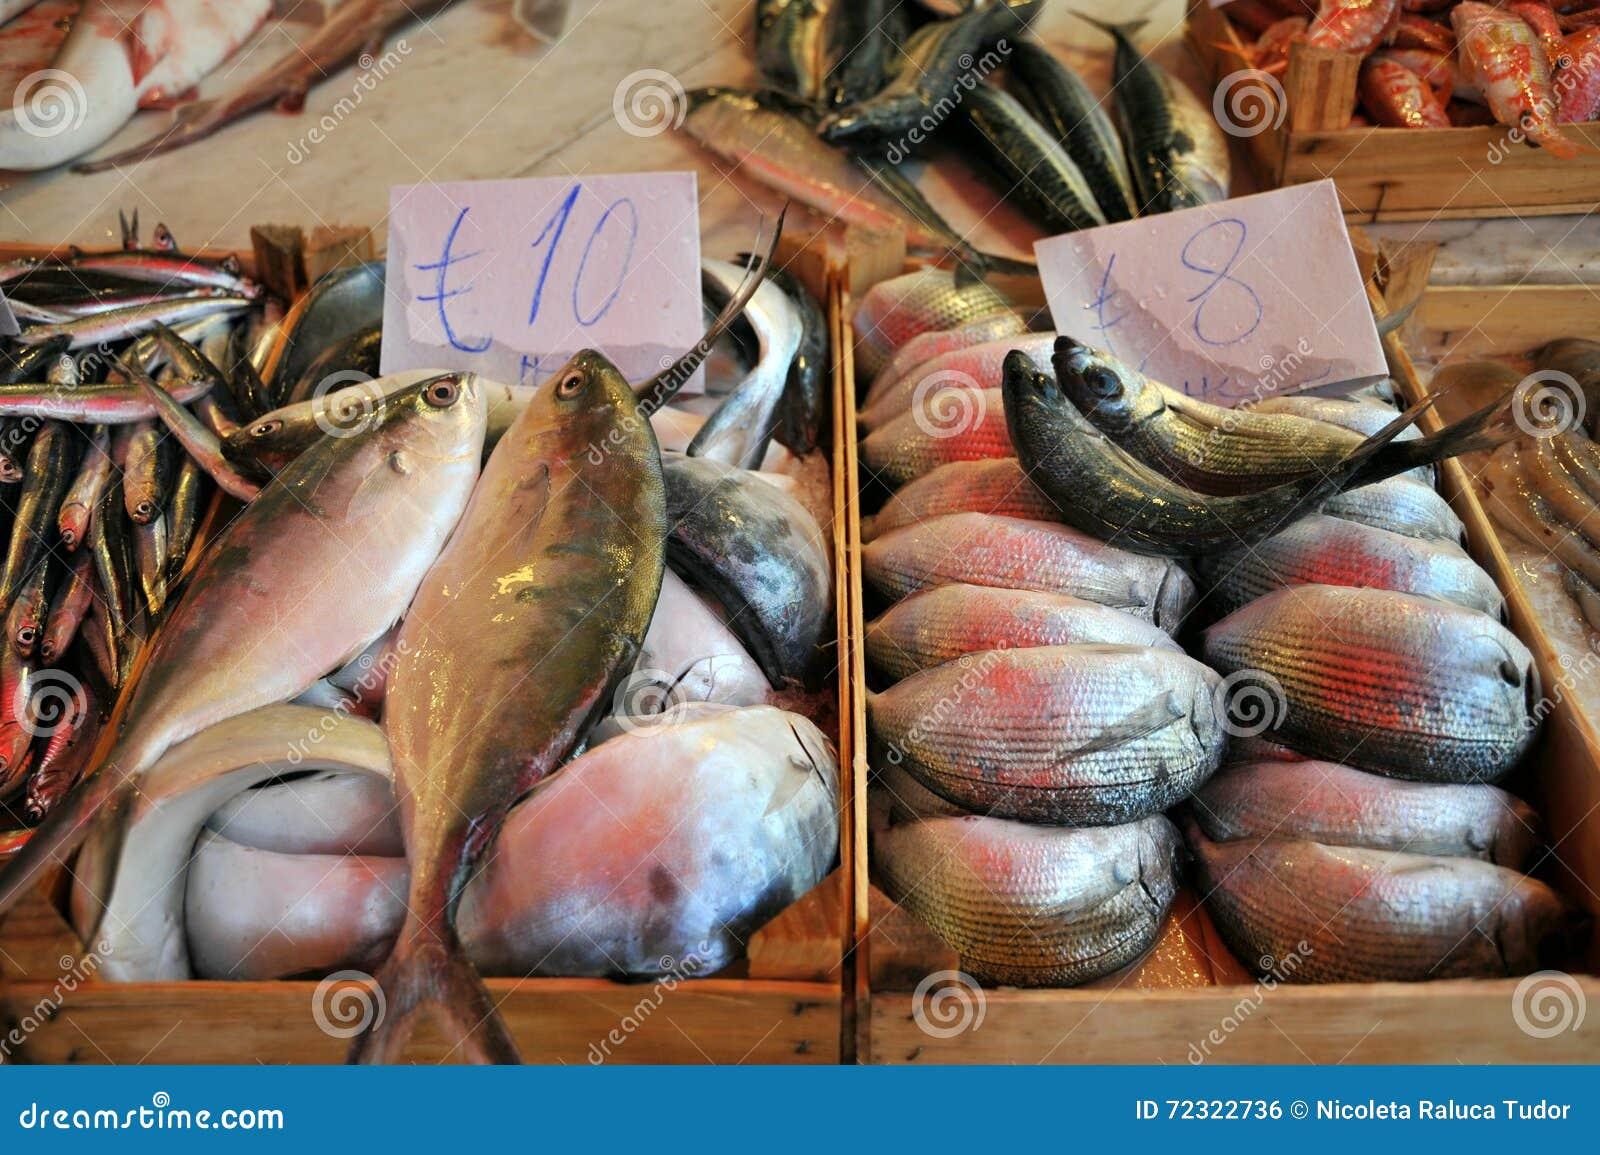 Palermo street market editorial photo for Cherry street fish market